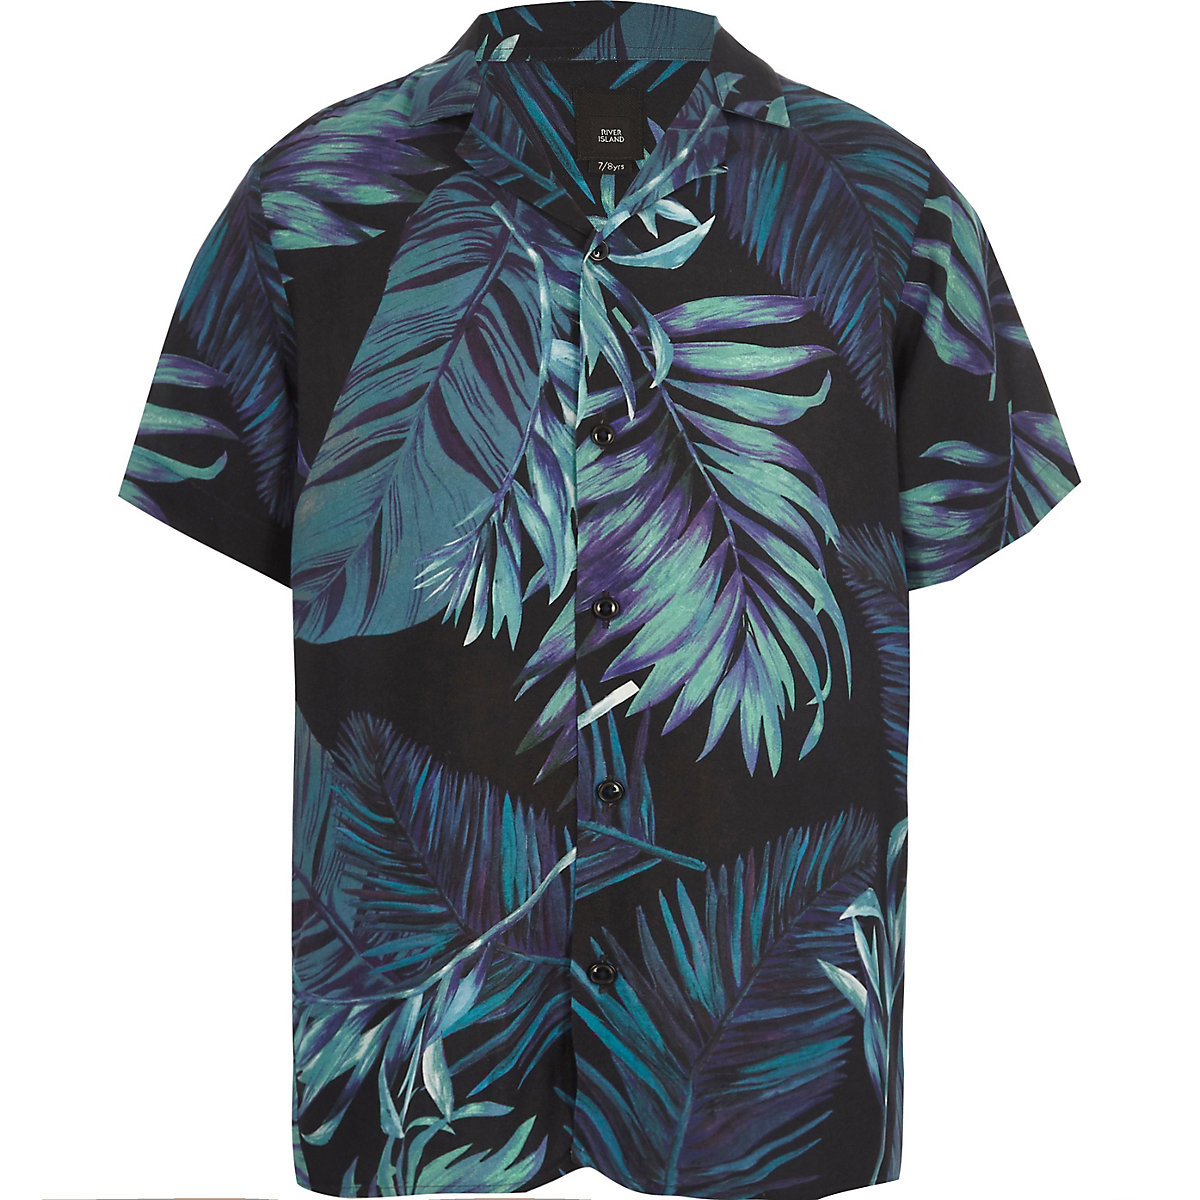 Boys navy leaf print short sleeve shirt